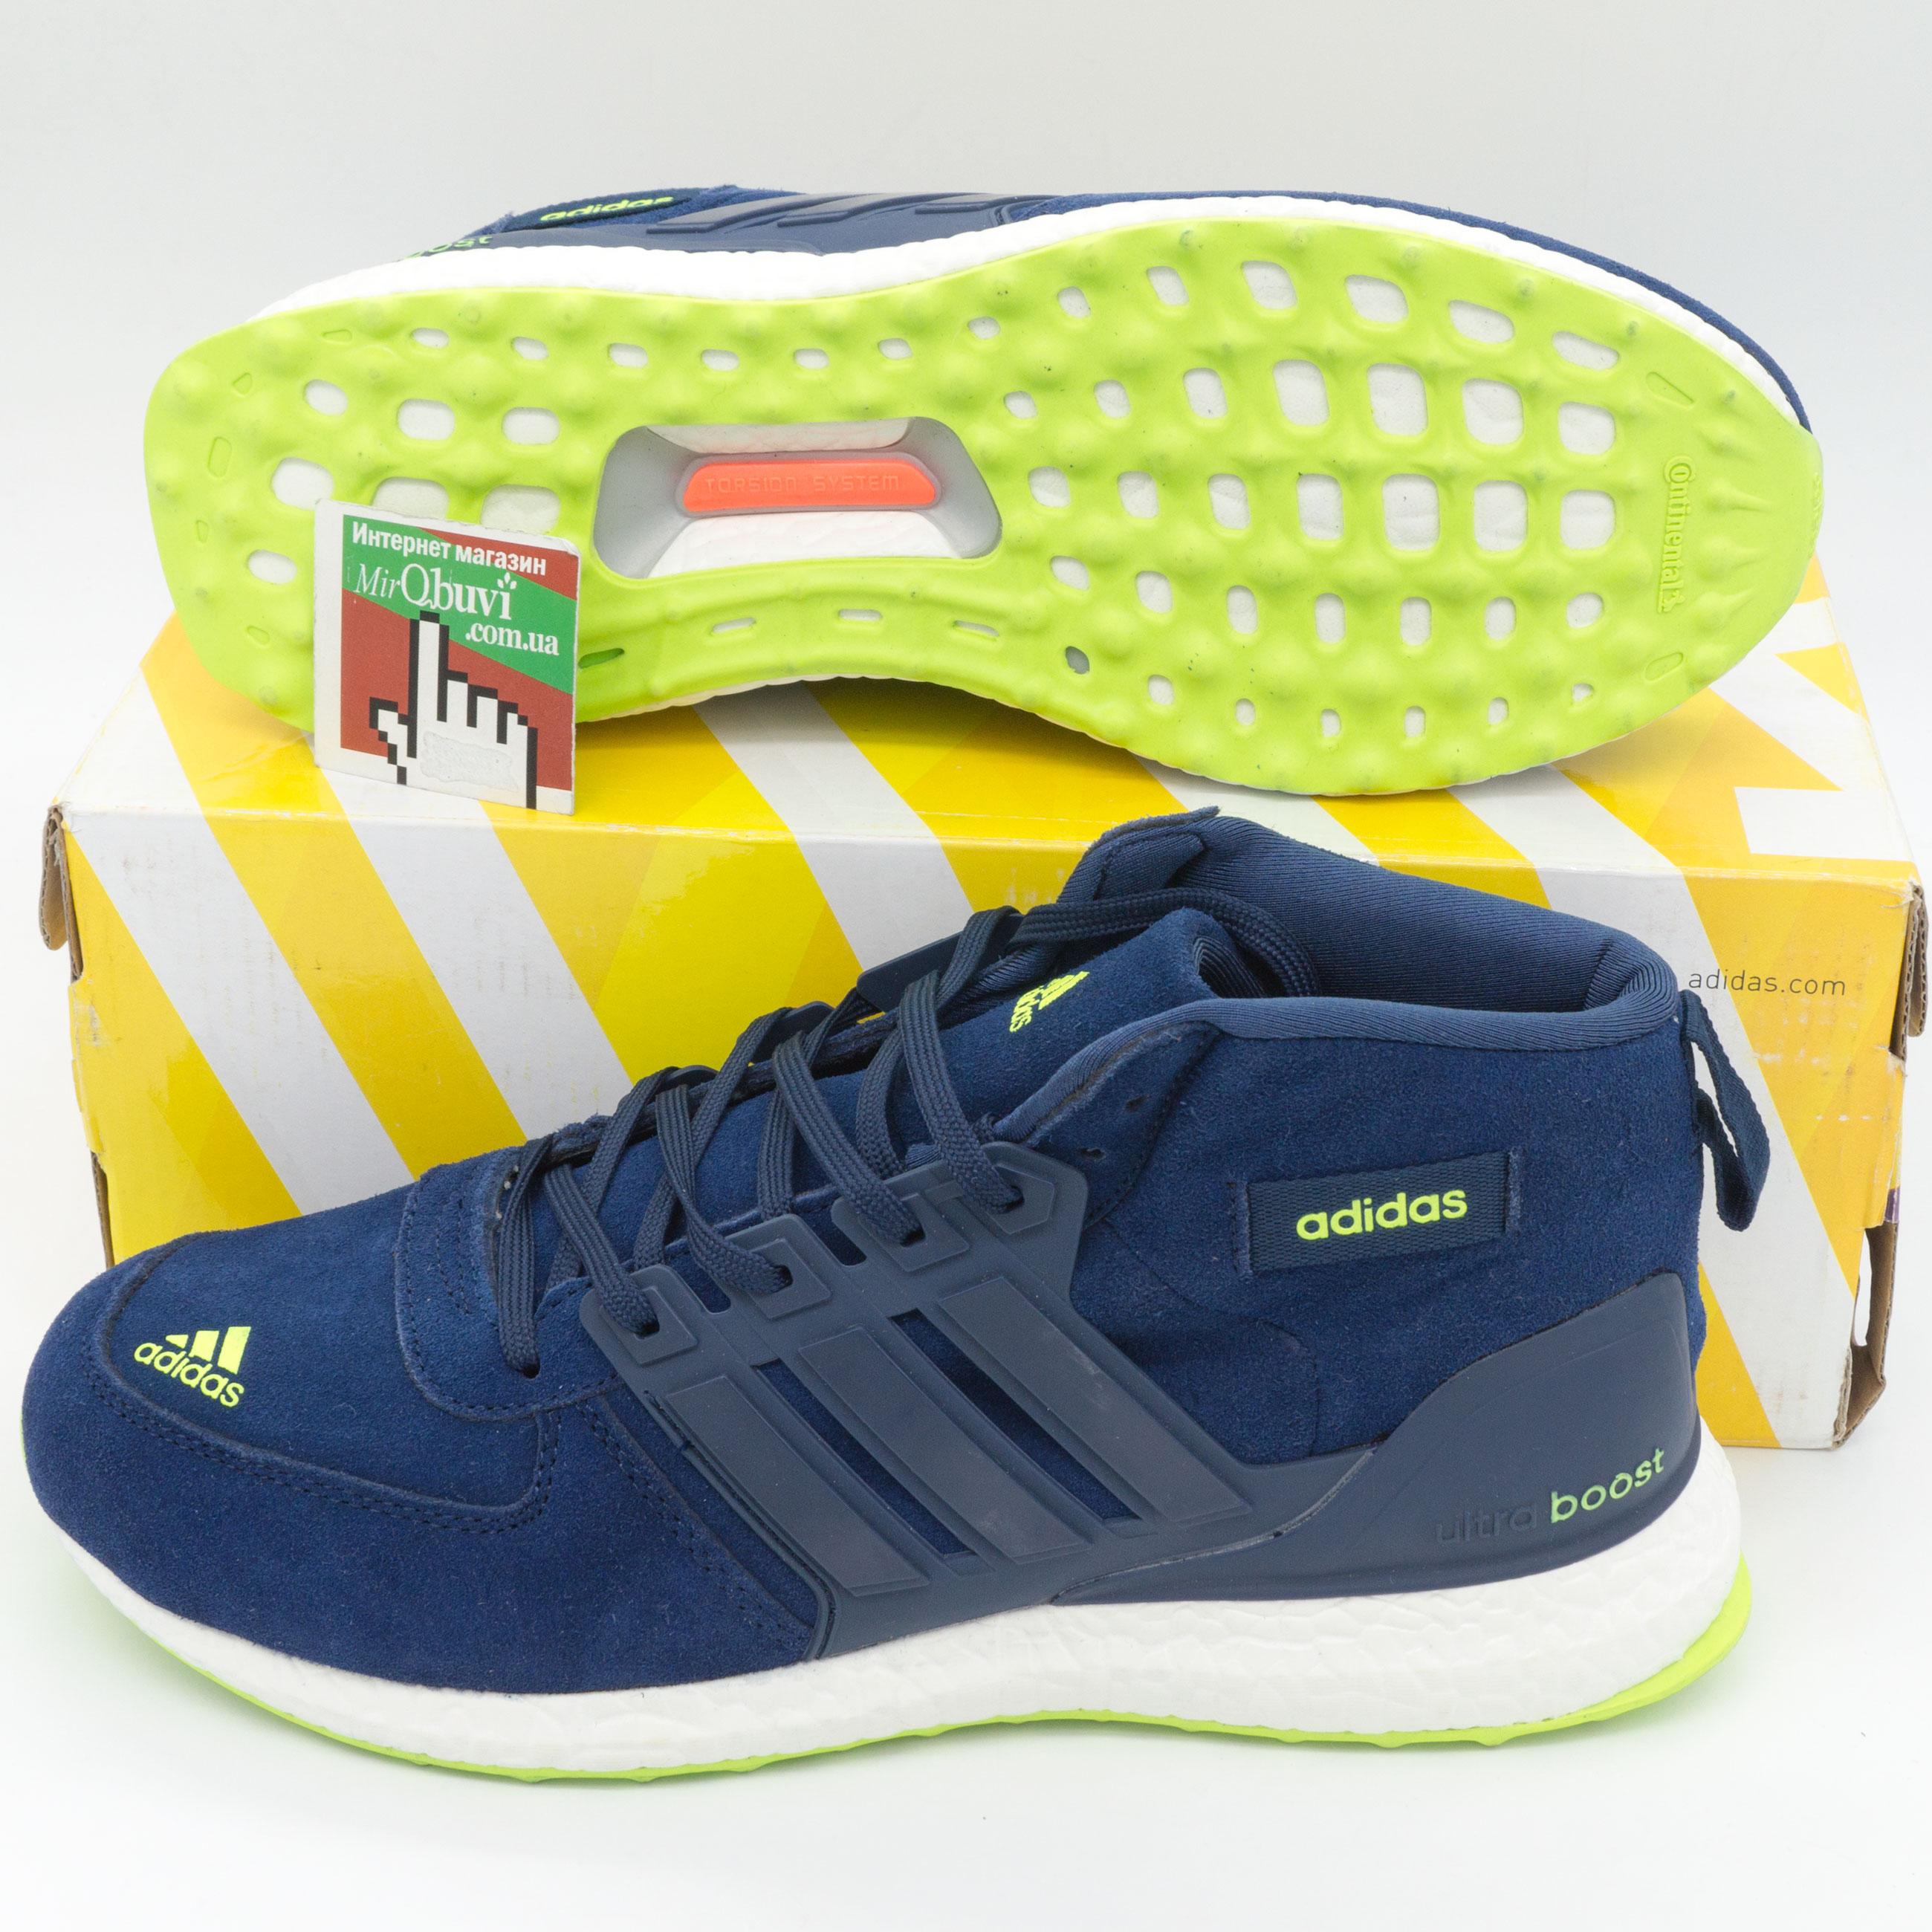 фото bottom Зимние кроссовки Adidas Ultra Boost синие Топ качество bottom